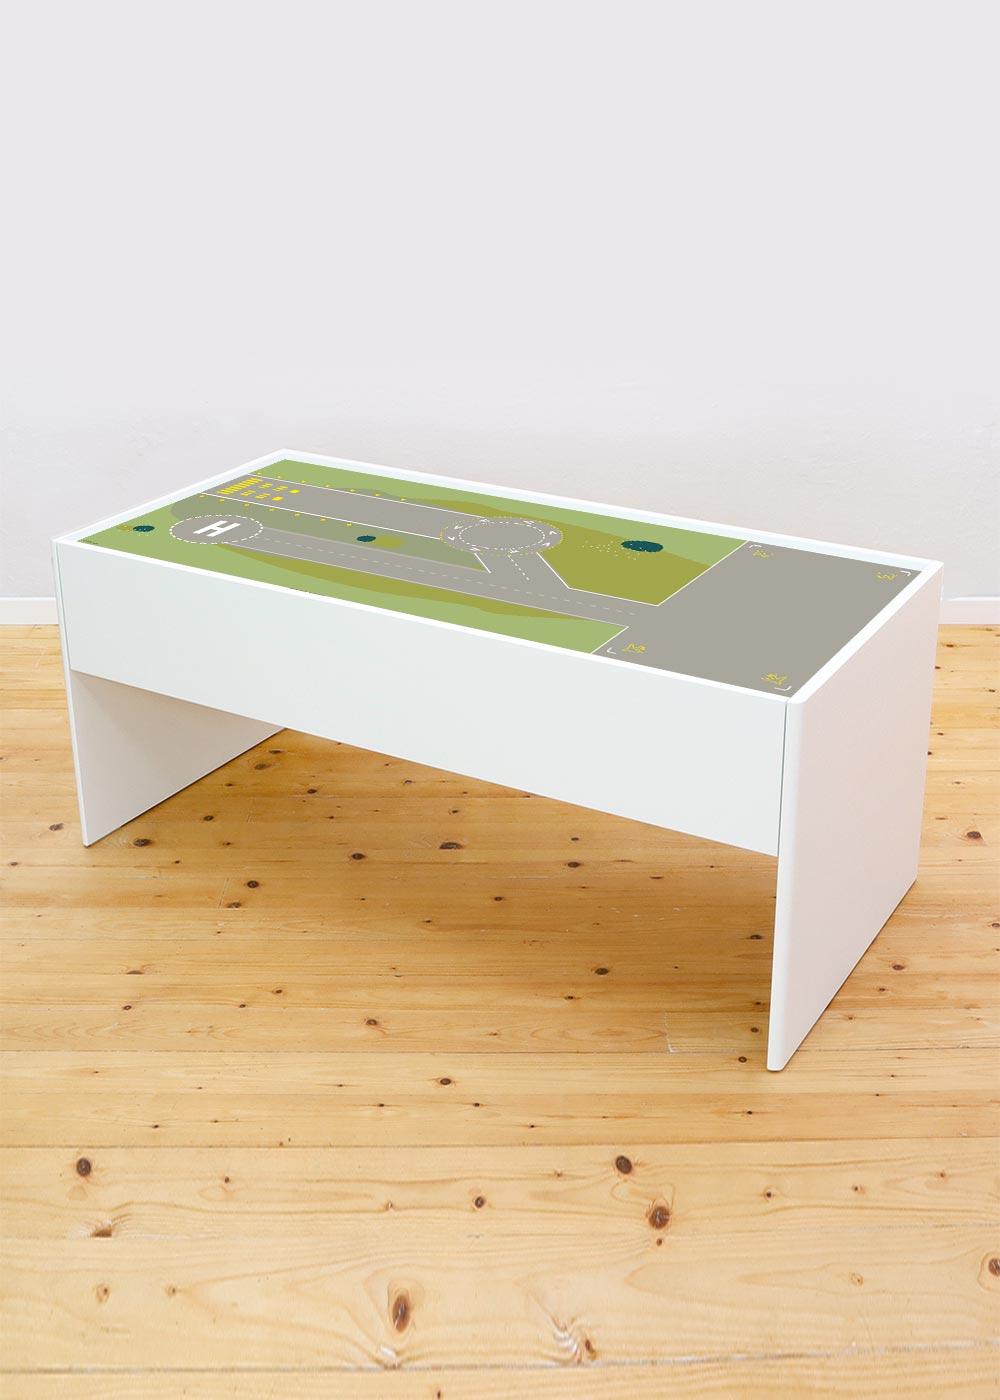 Ikea Dundra Spieltisch Landebahn Komplettansicht